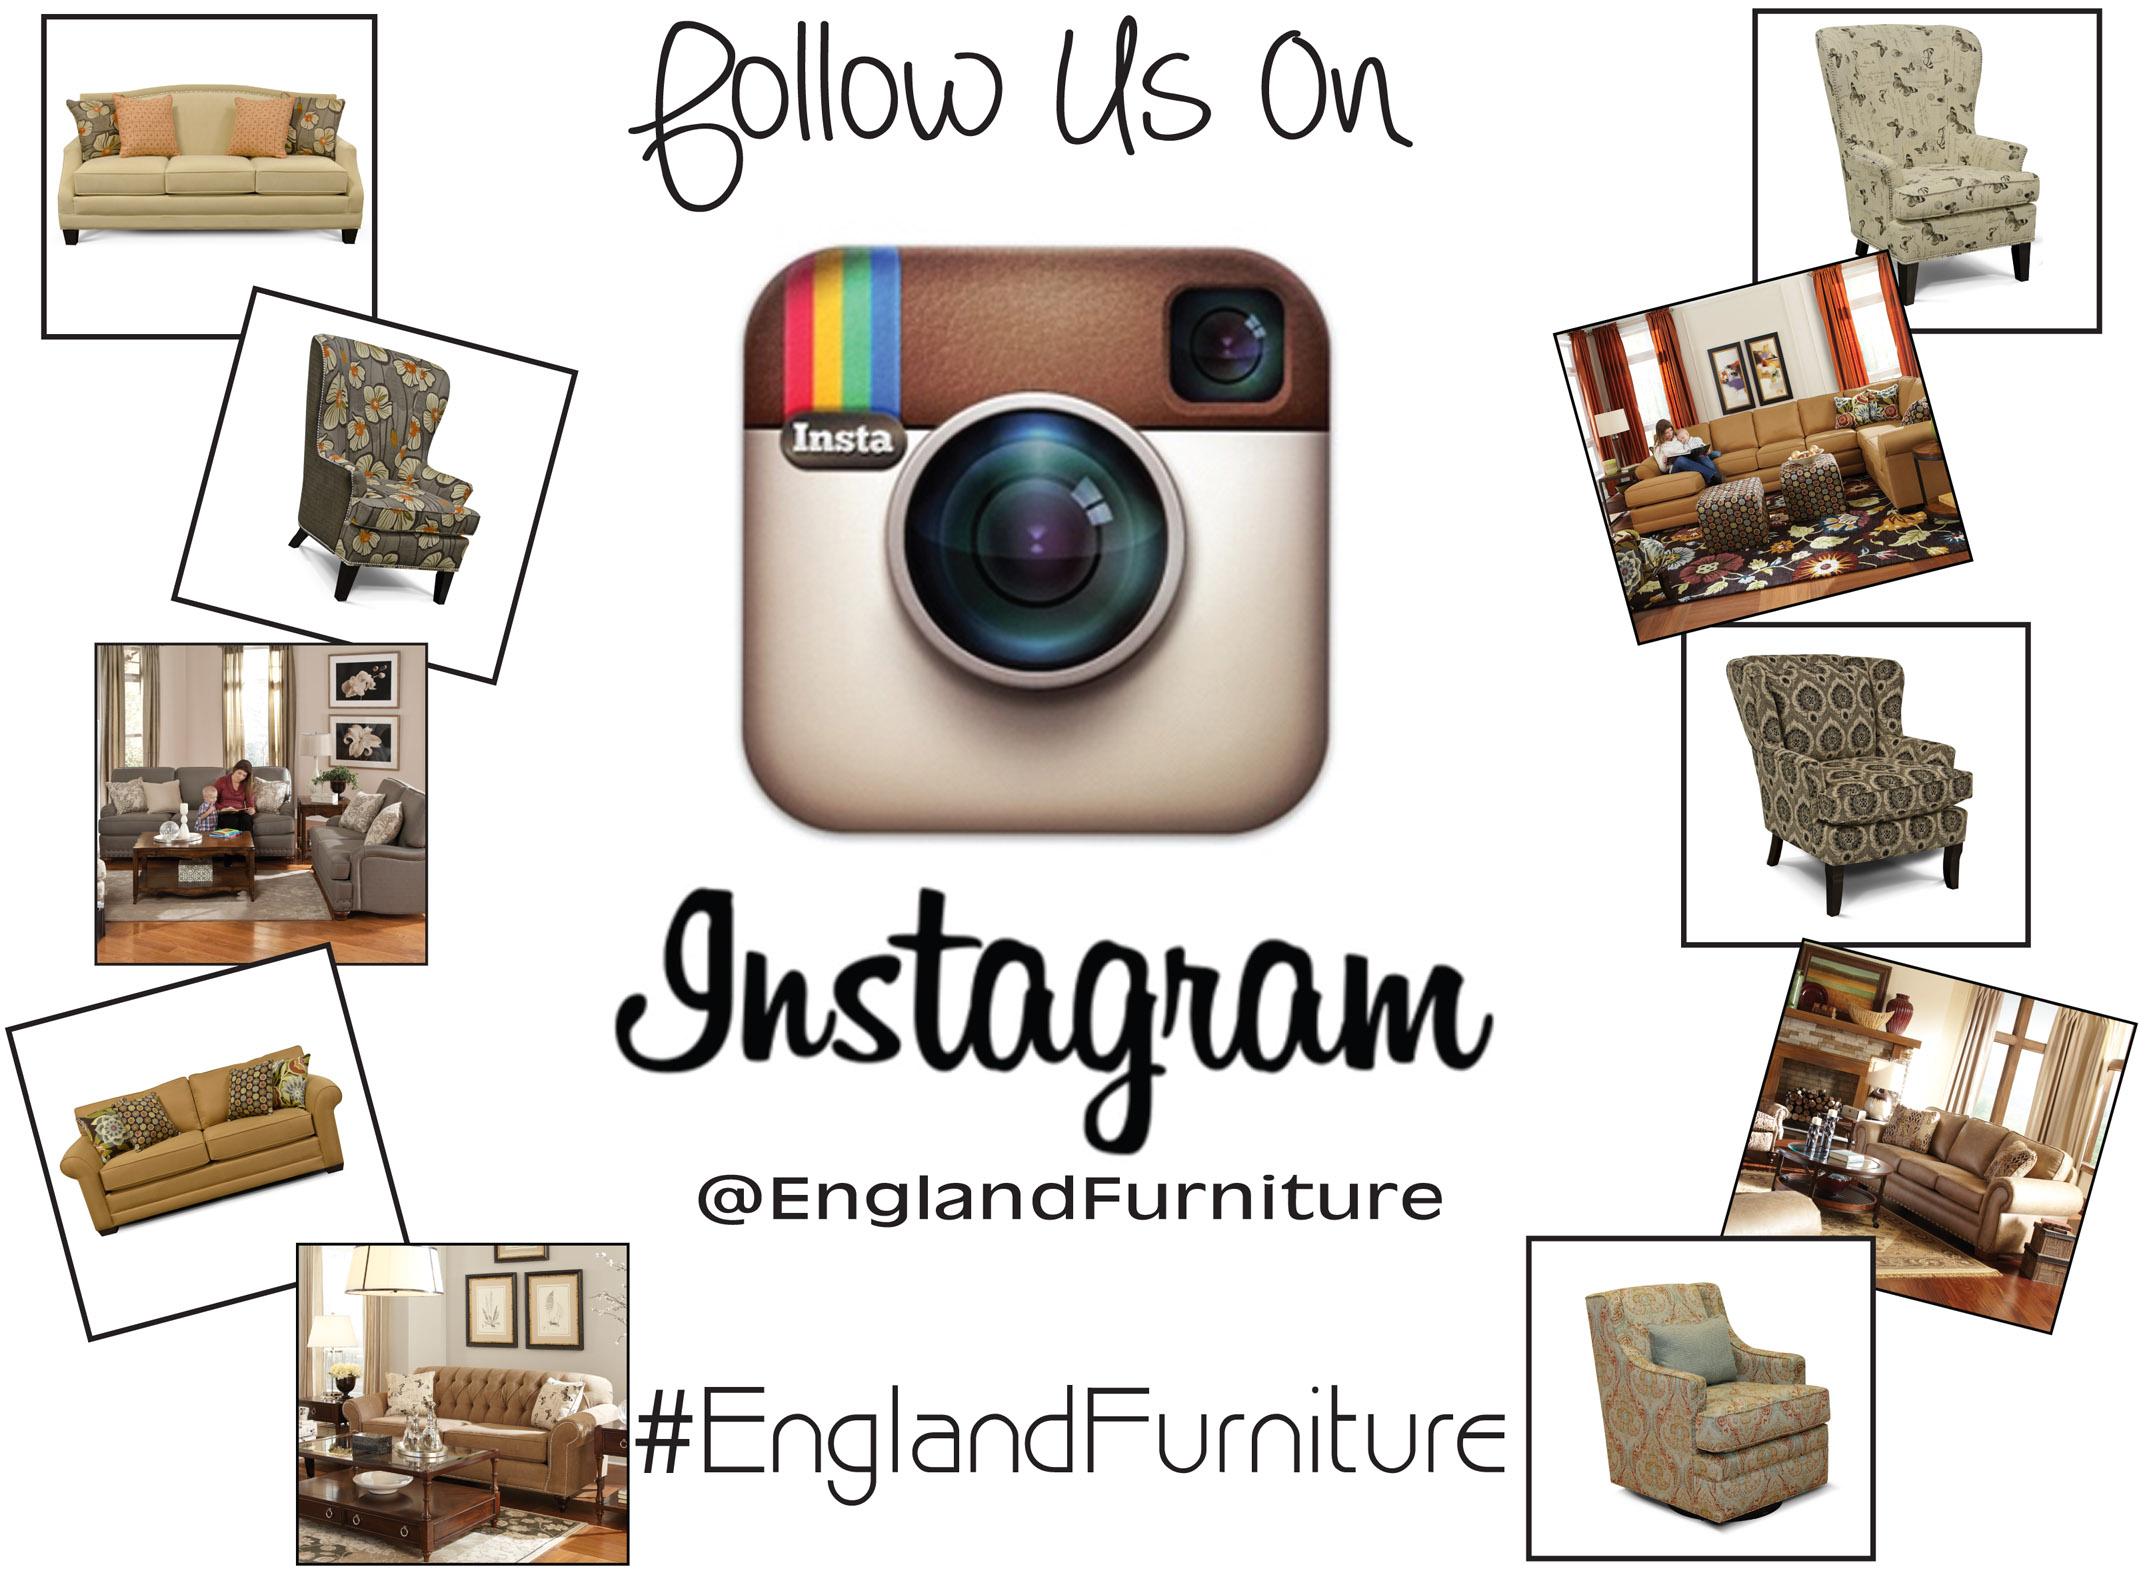 England Furniture Instagram